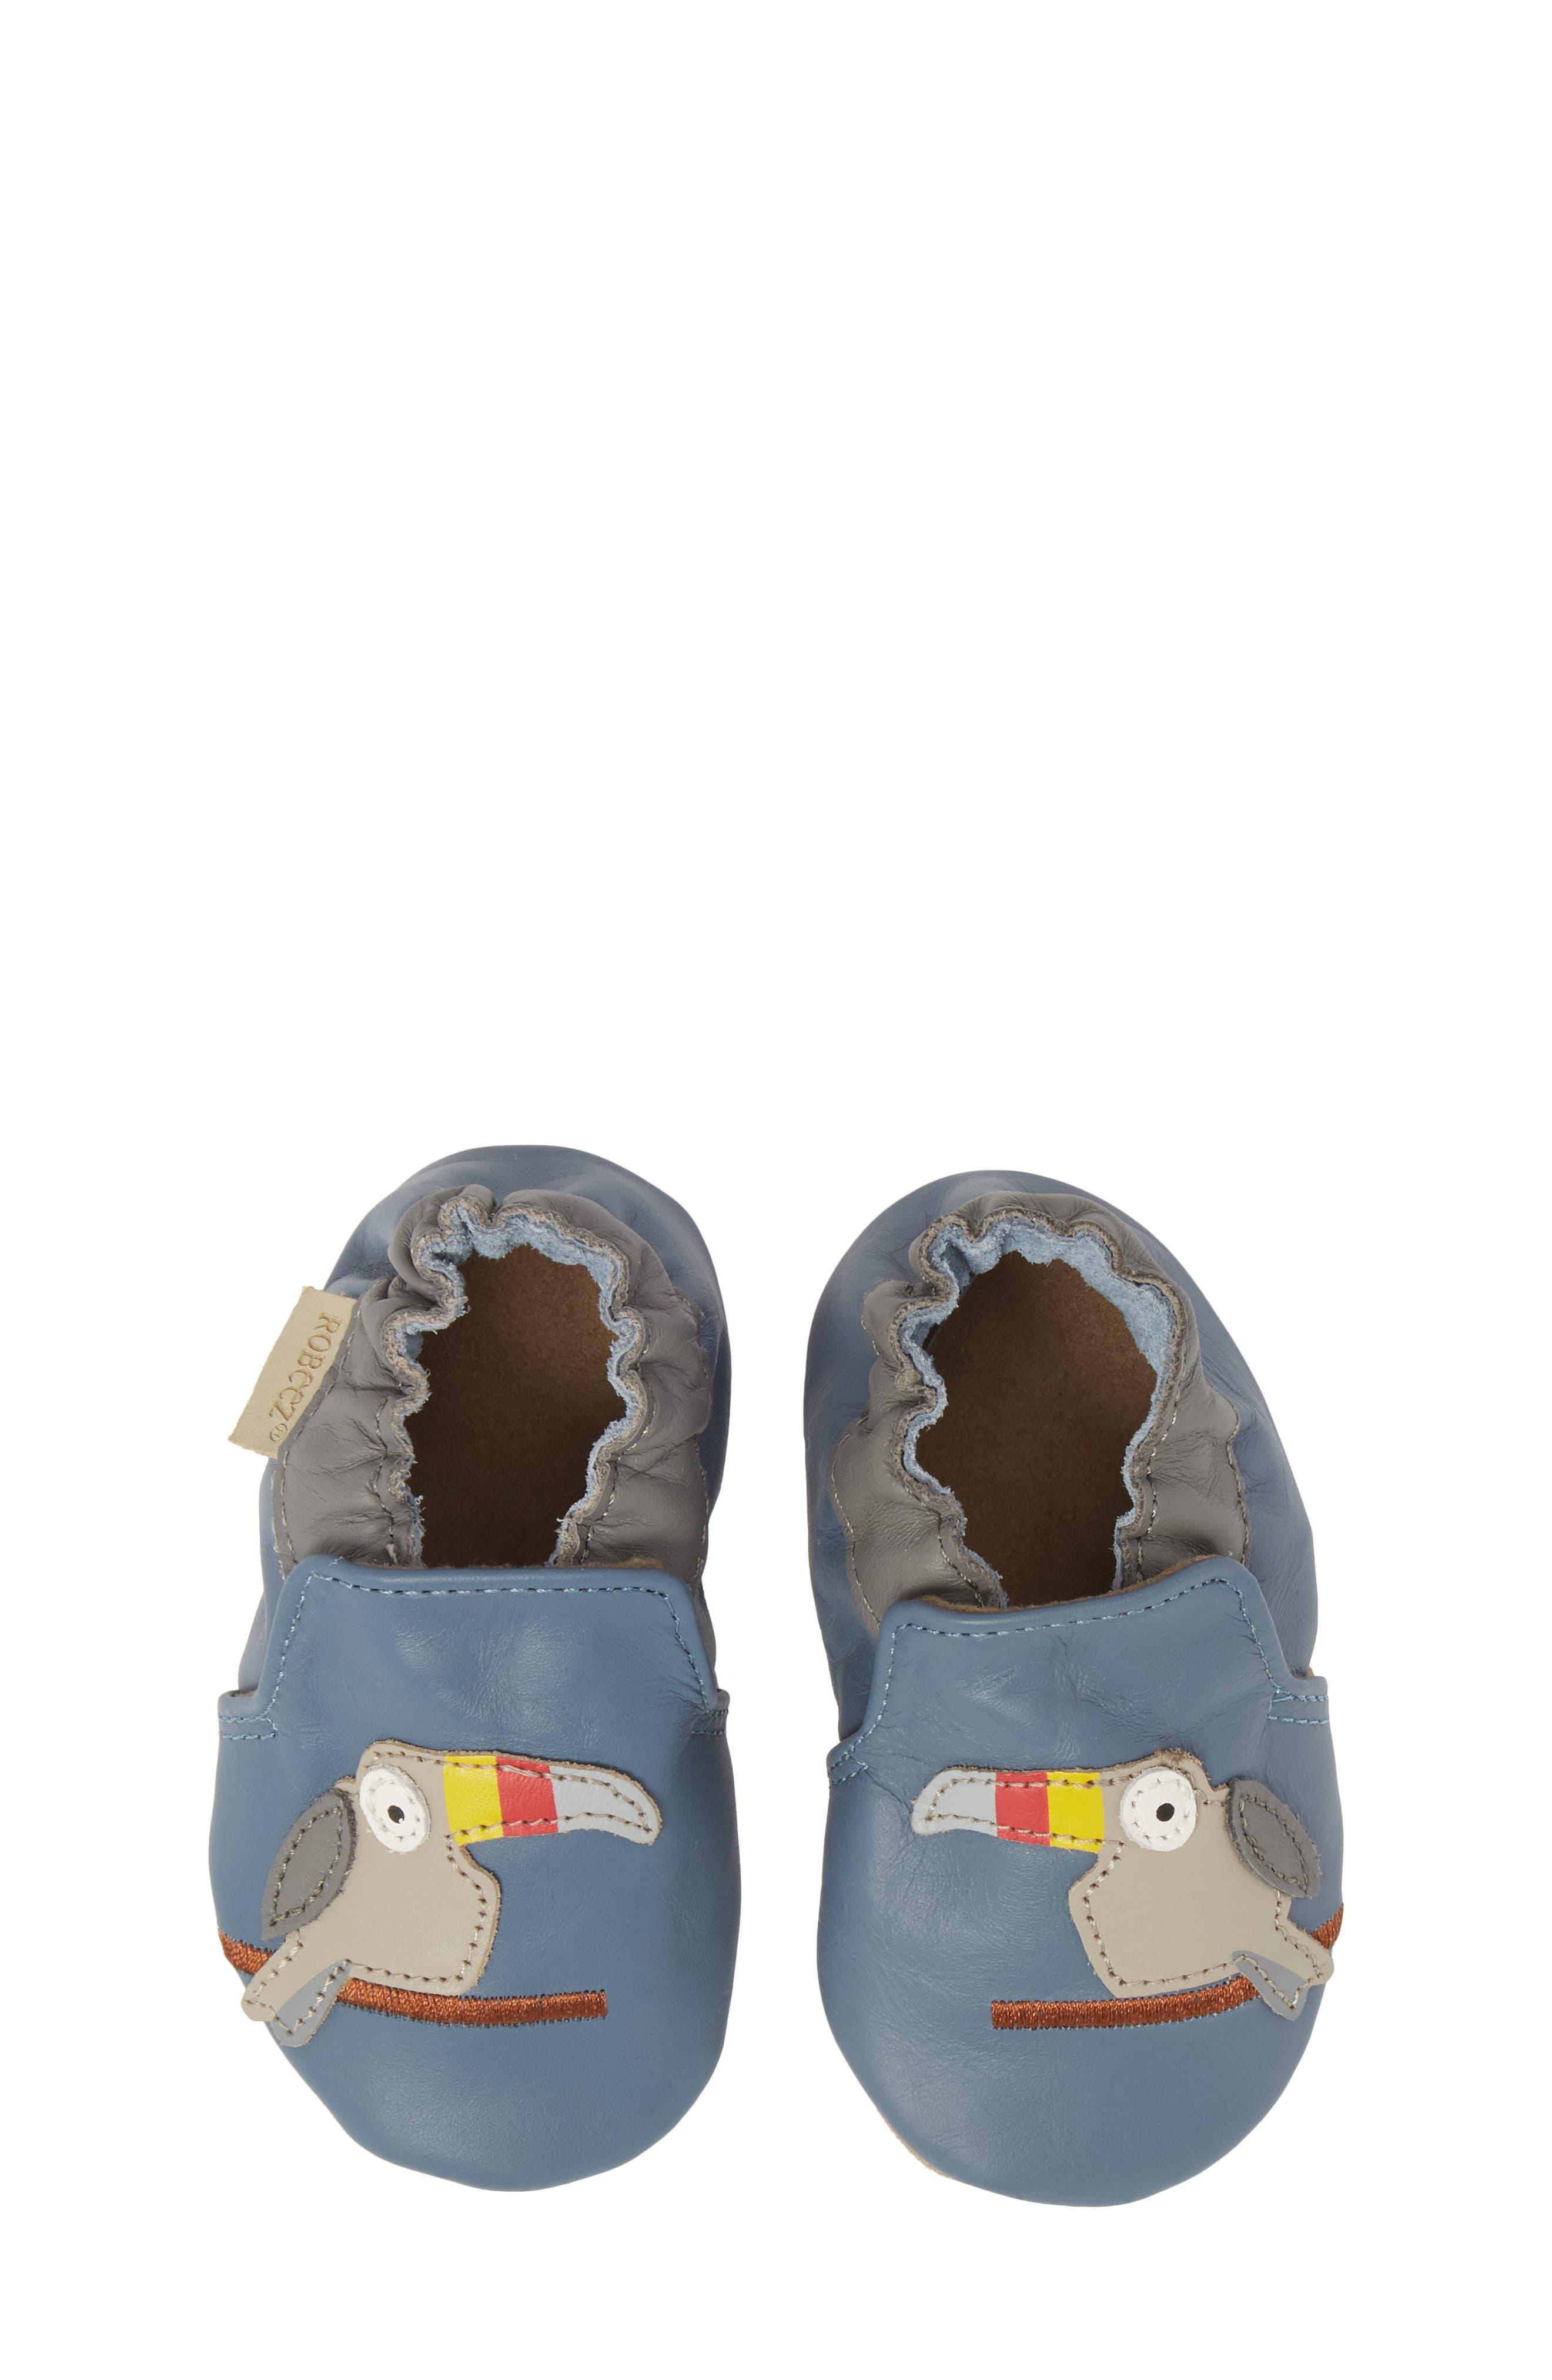 Toucan Tom Moccasin Crib Shoe,                             Alternate thumbnail 5, color,                             450